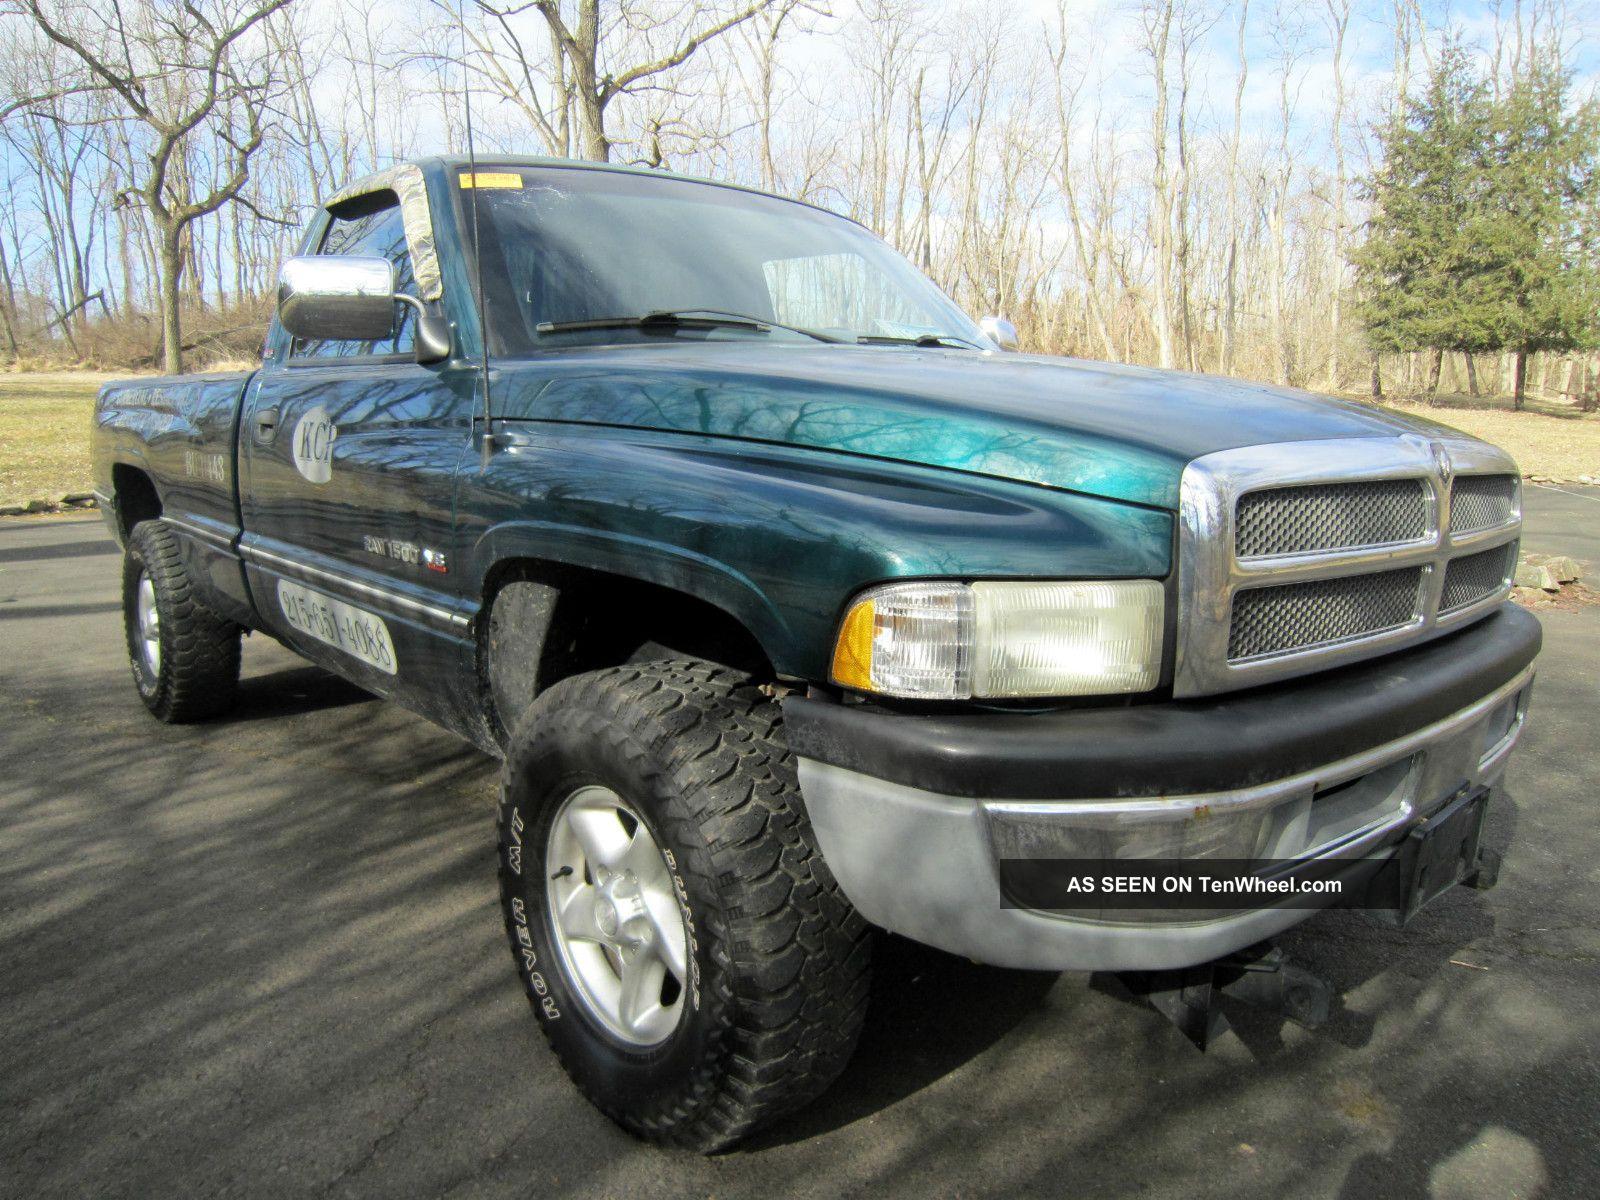 1997 dodge ram 1500 laramie slt pickup truck with 4x4 and. Black Bedroom Furniture Sets. Home Design Ideas